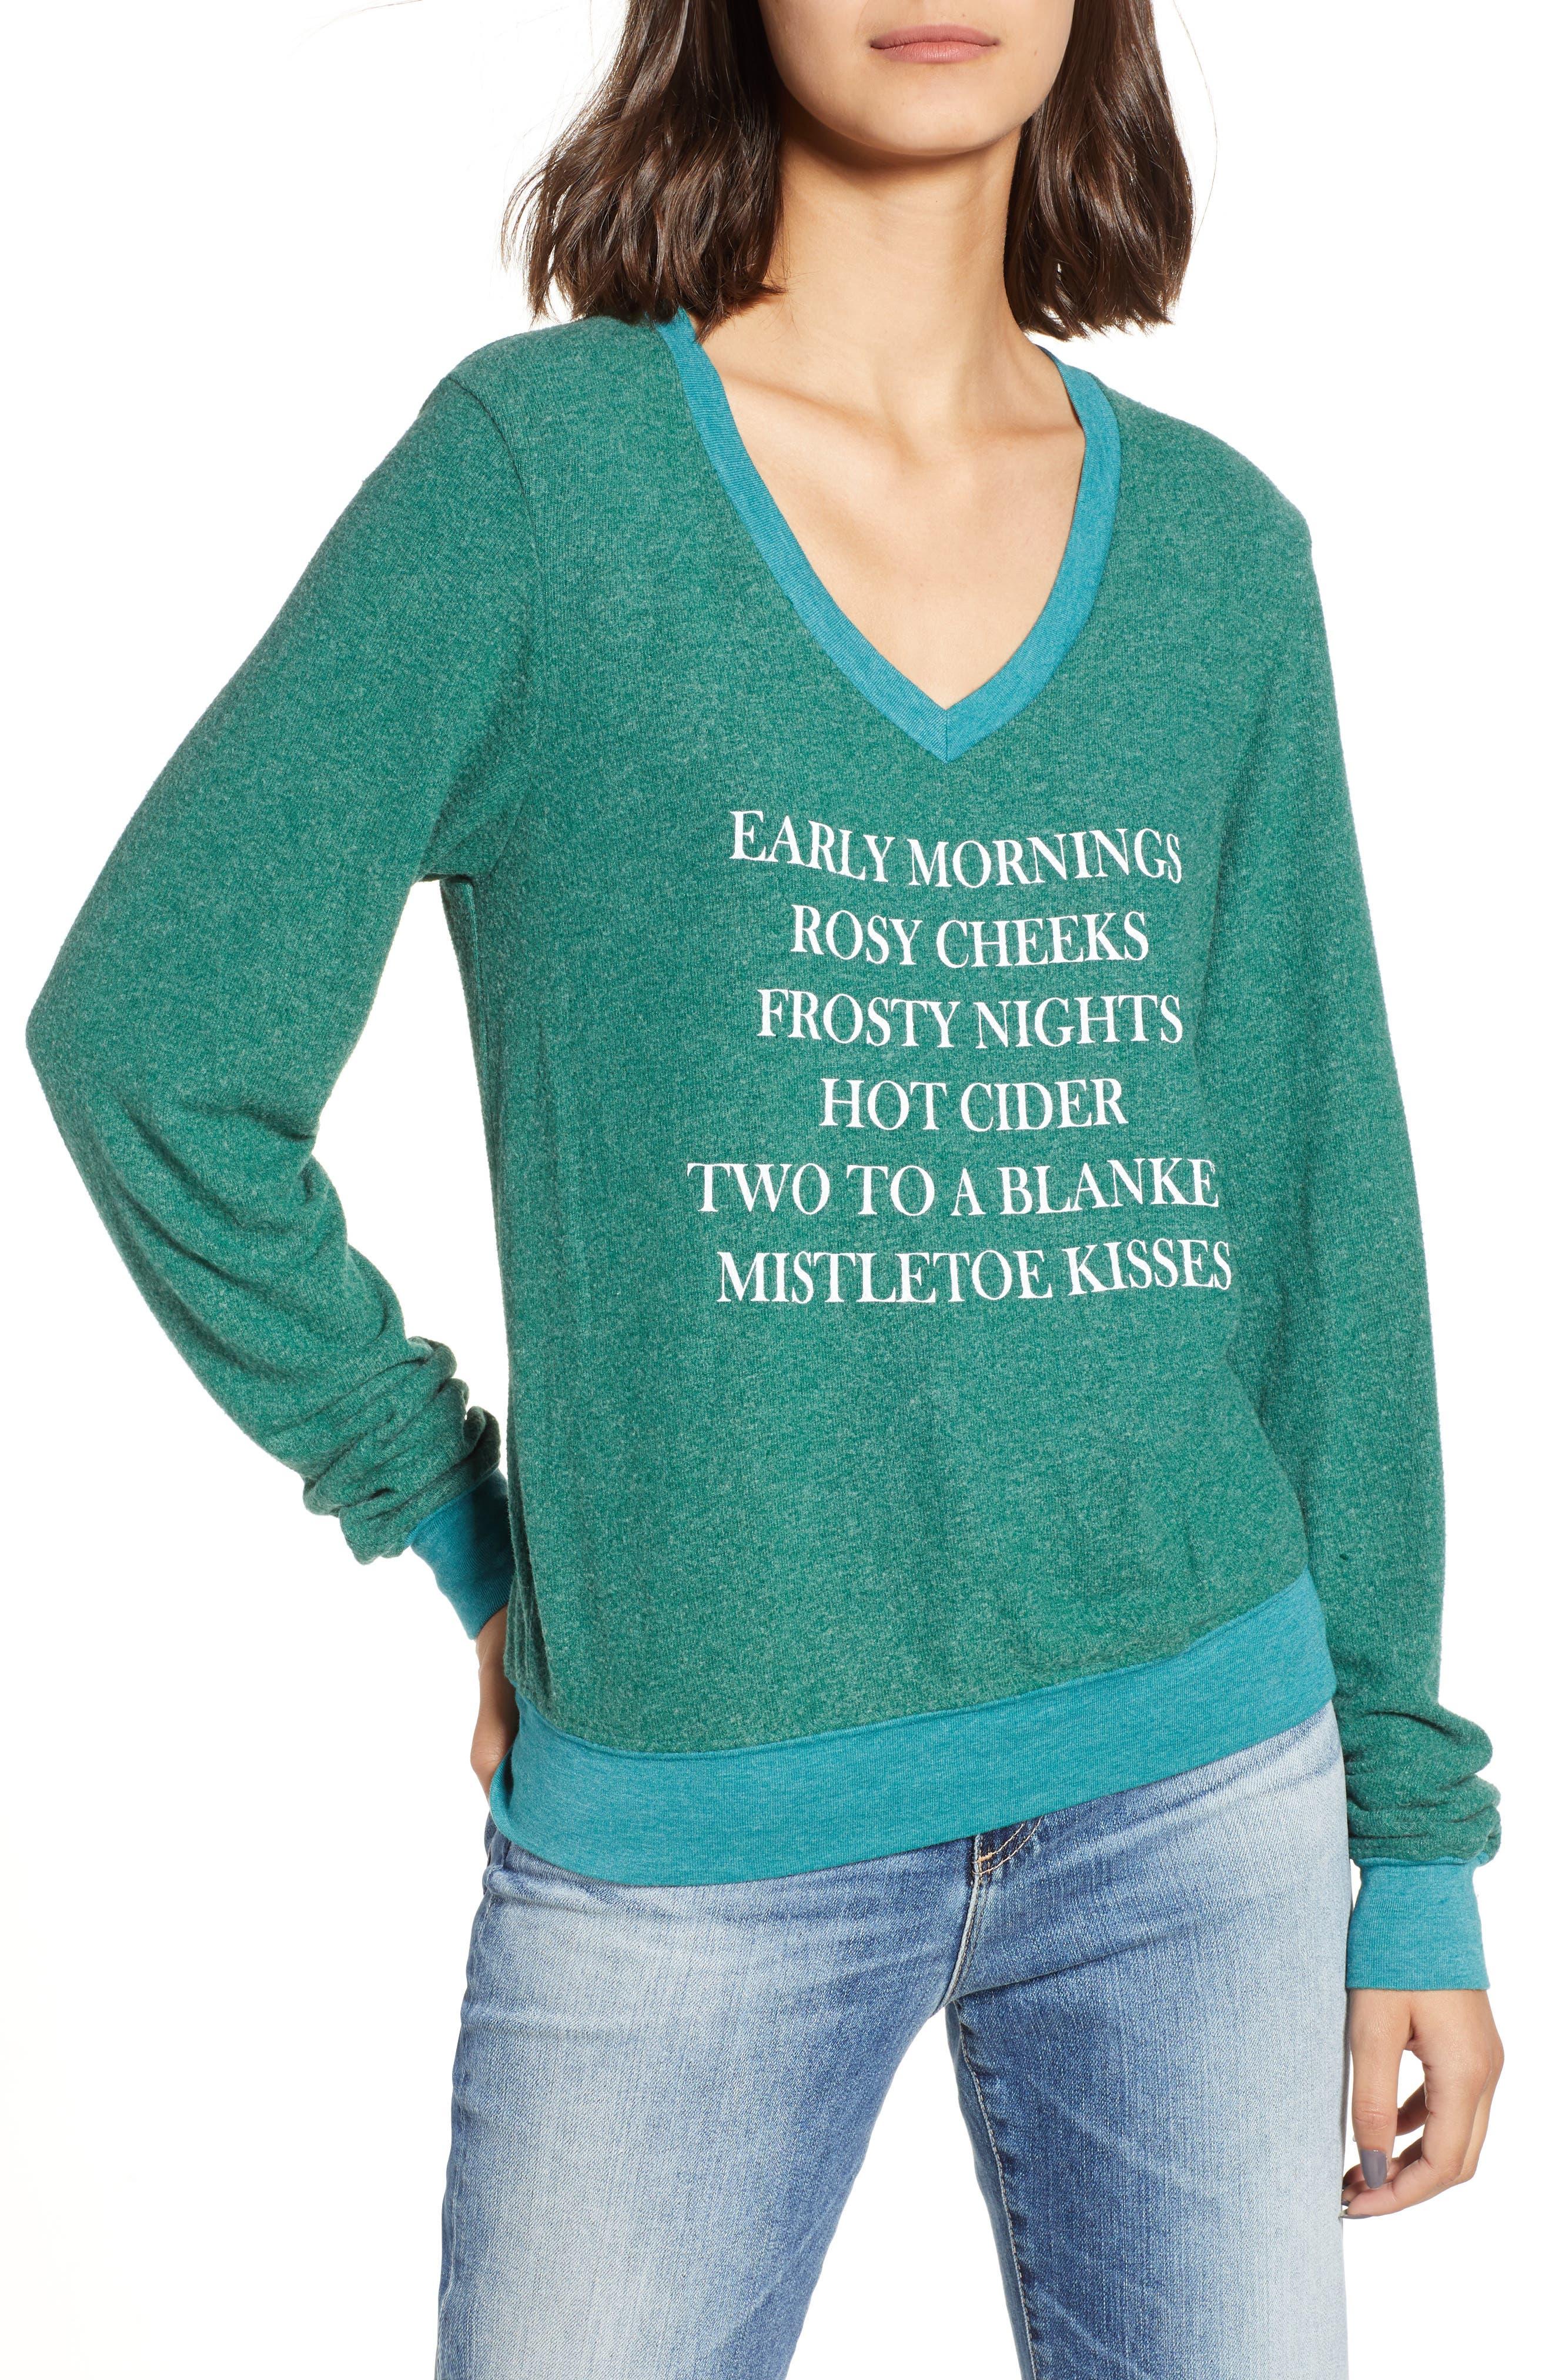 Mistletoe Kisses Sweater,                         Main,                         color, WOODFALL GREEN